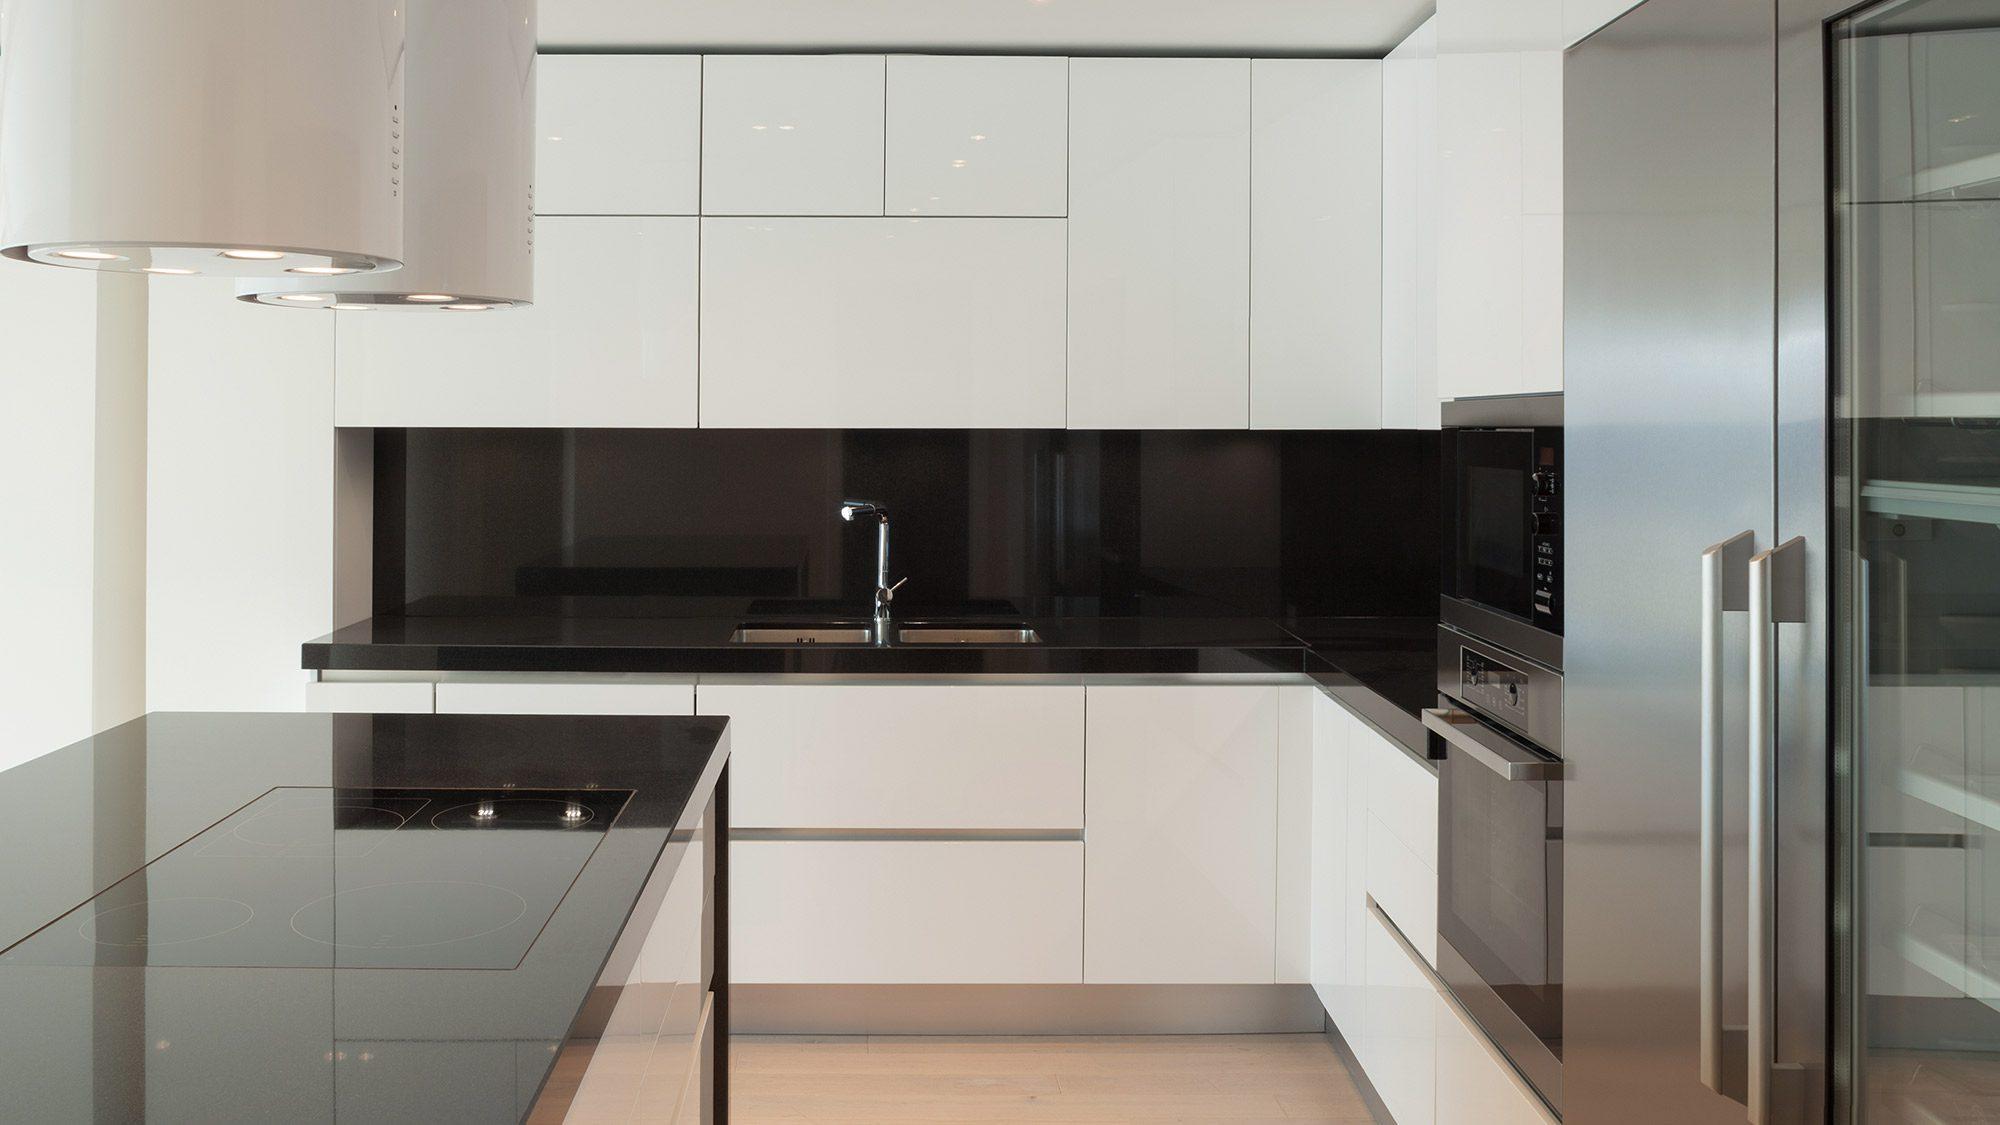 9 Bold and Beautiful Kitchen Backsplash Design Ideas ... on Black Countertop Backsplash Ideas  id=55780